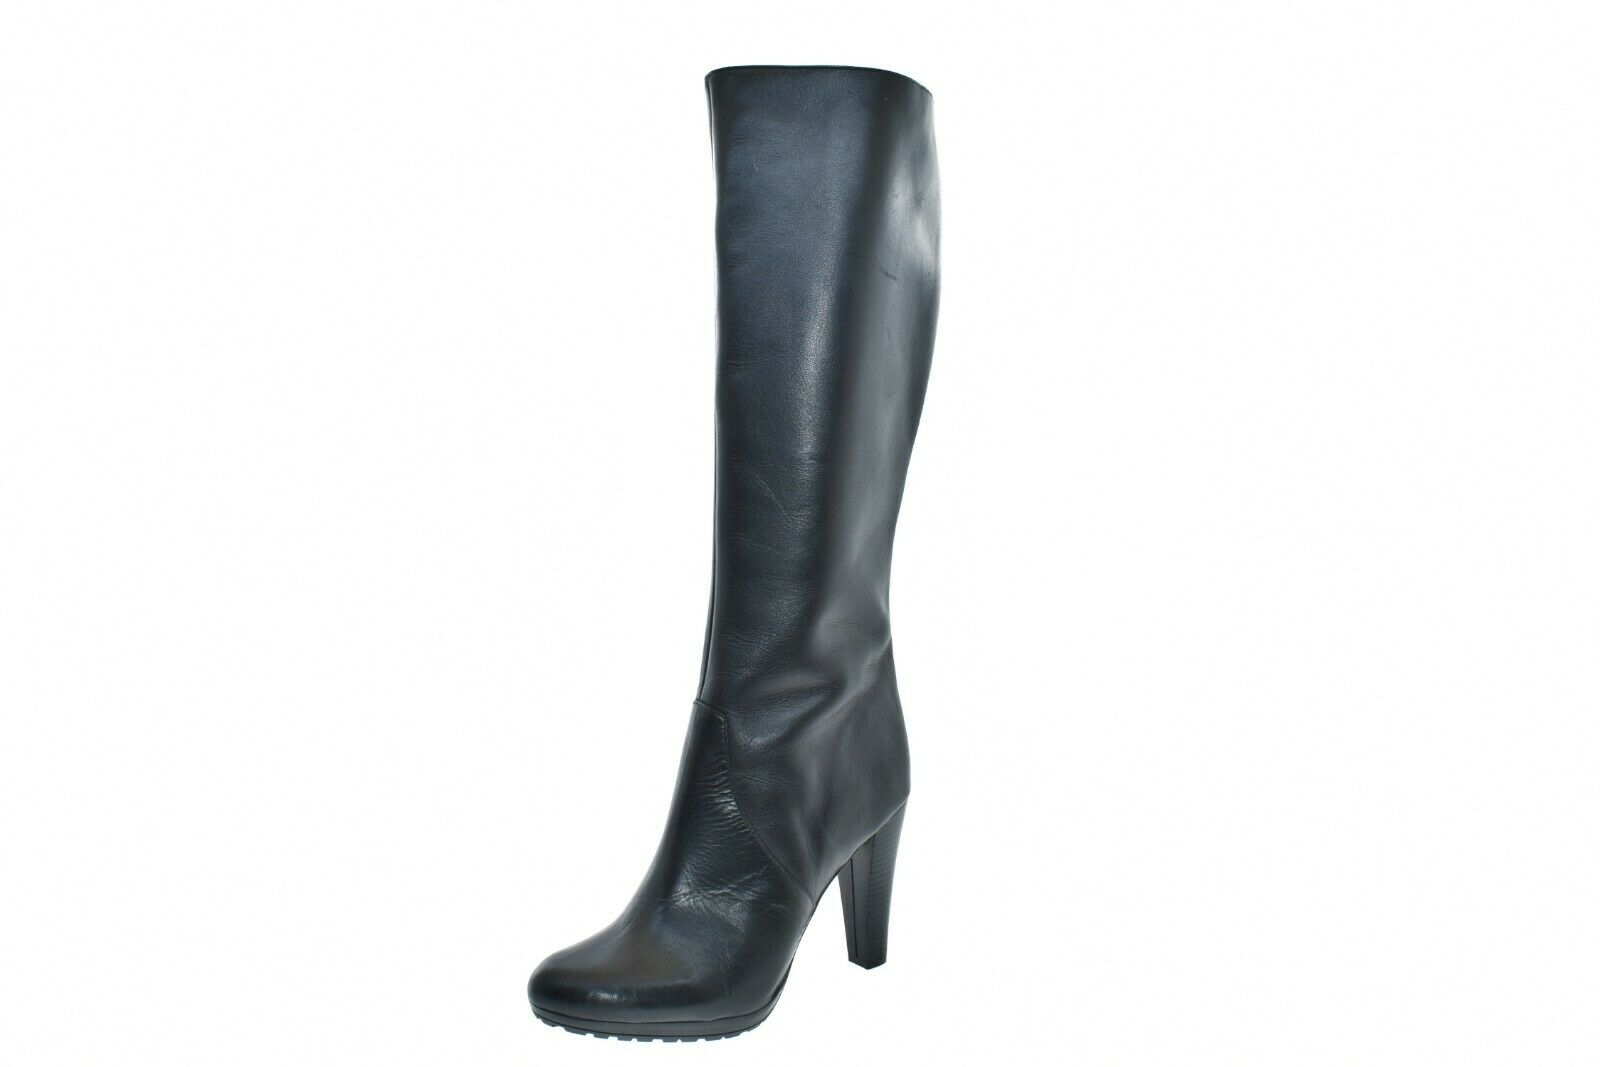 Pascal Morabito Damen Schuhe Stiefel Stiefeletten Schwarz Gr 40 Leder damen